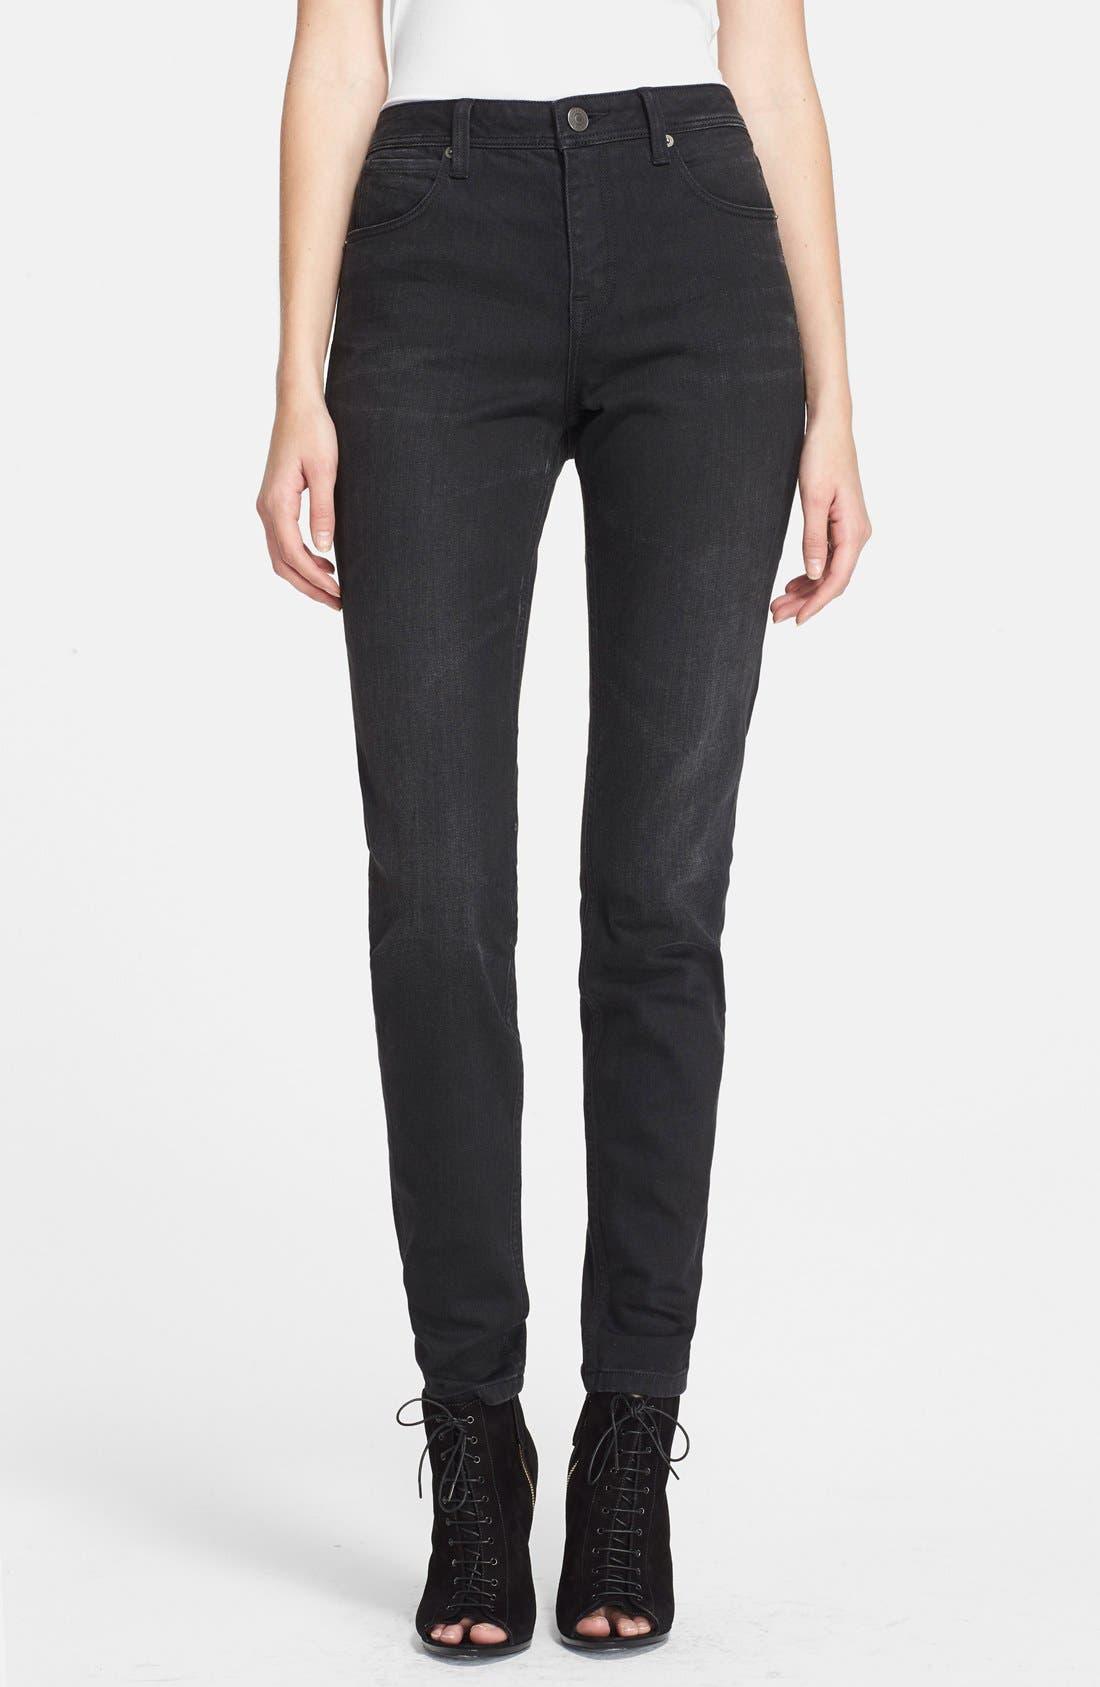 BURBERRY BRIT, Skinny Jeans, Main thumbnail 1, color, 001